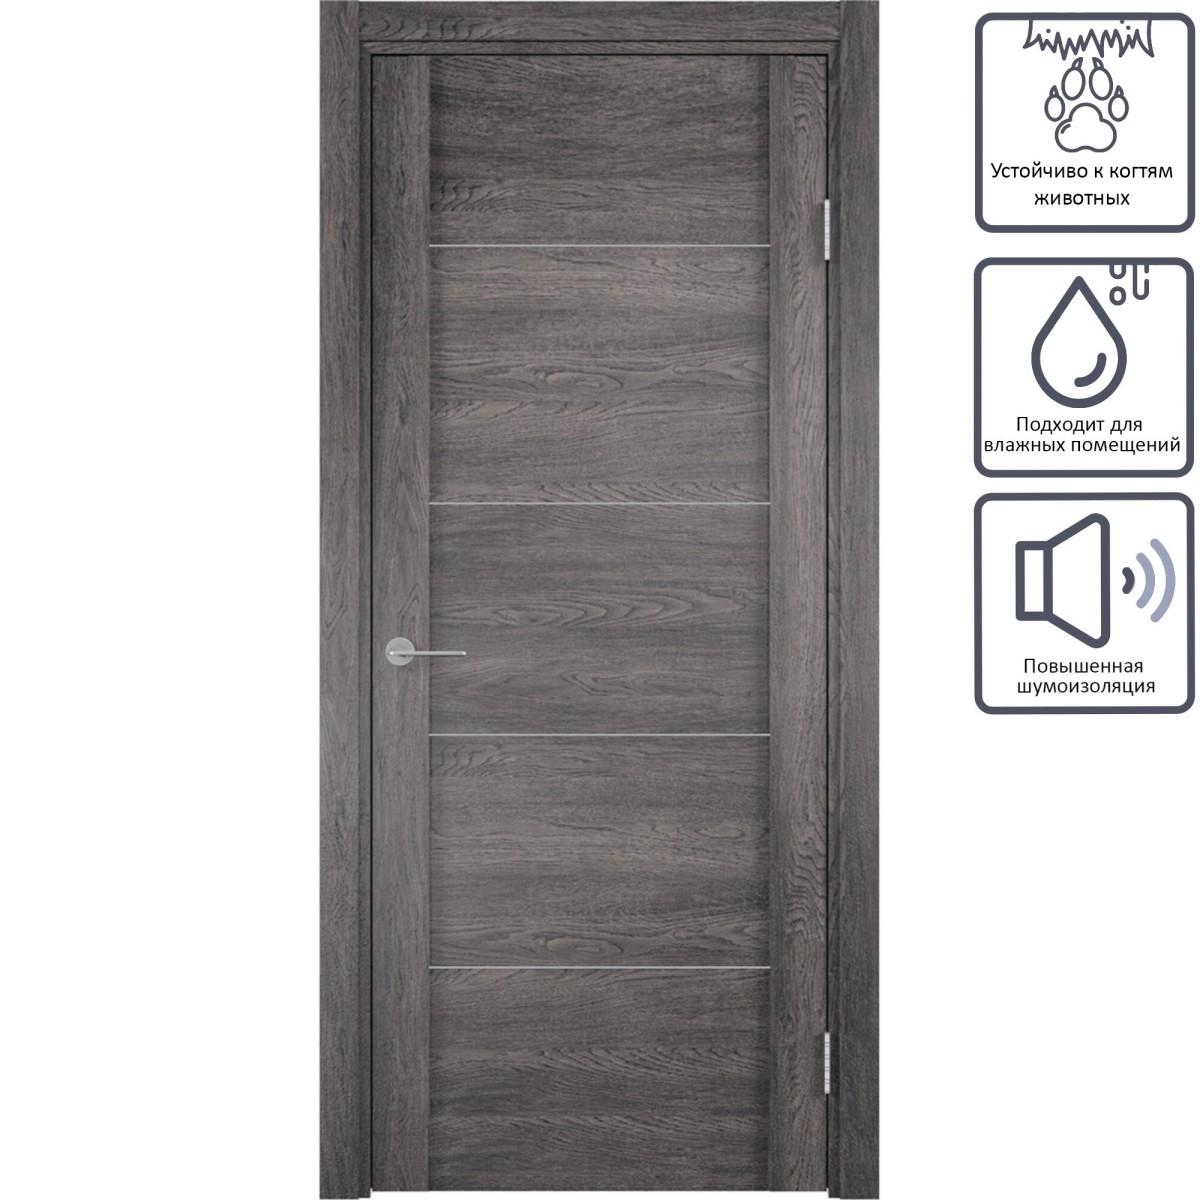 Дверь Межкомнатная Глухая С Замком В Комплекте Квадро 200x90 Пвх Цвет Шале Серый